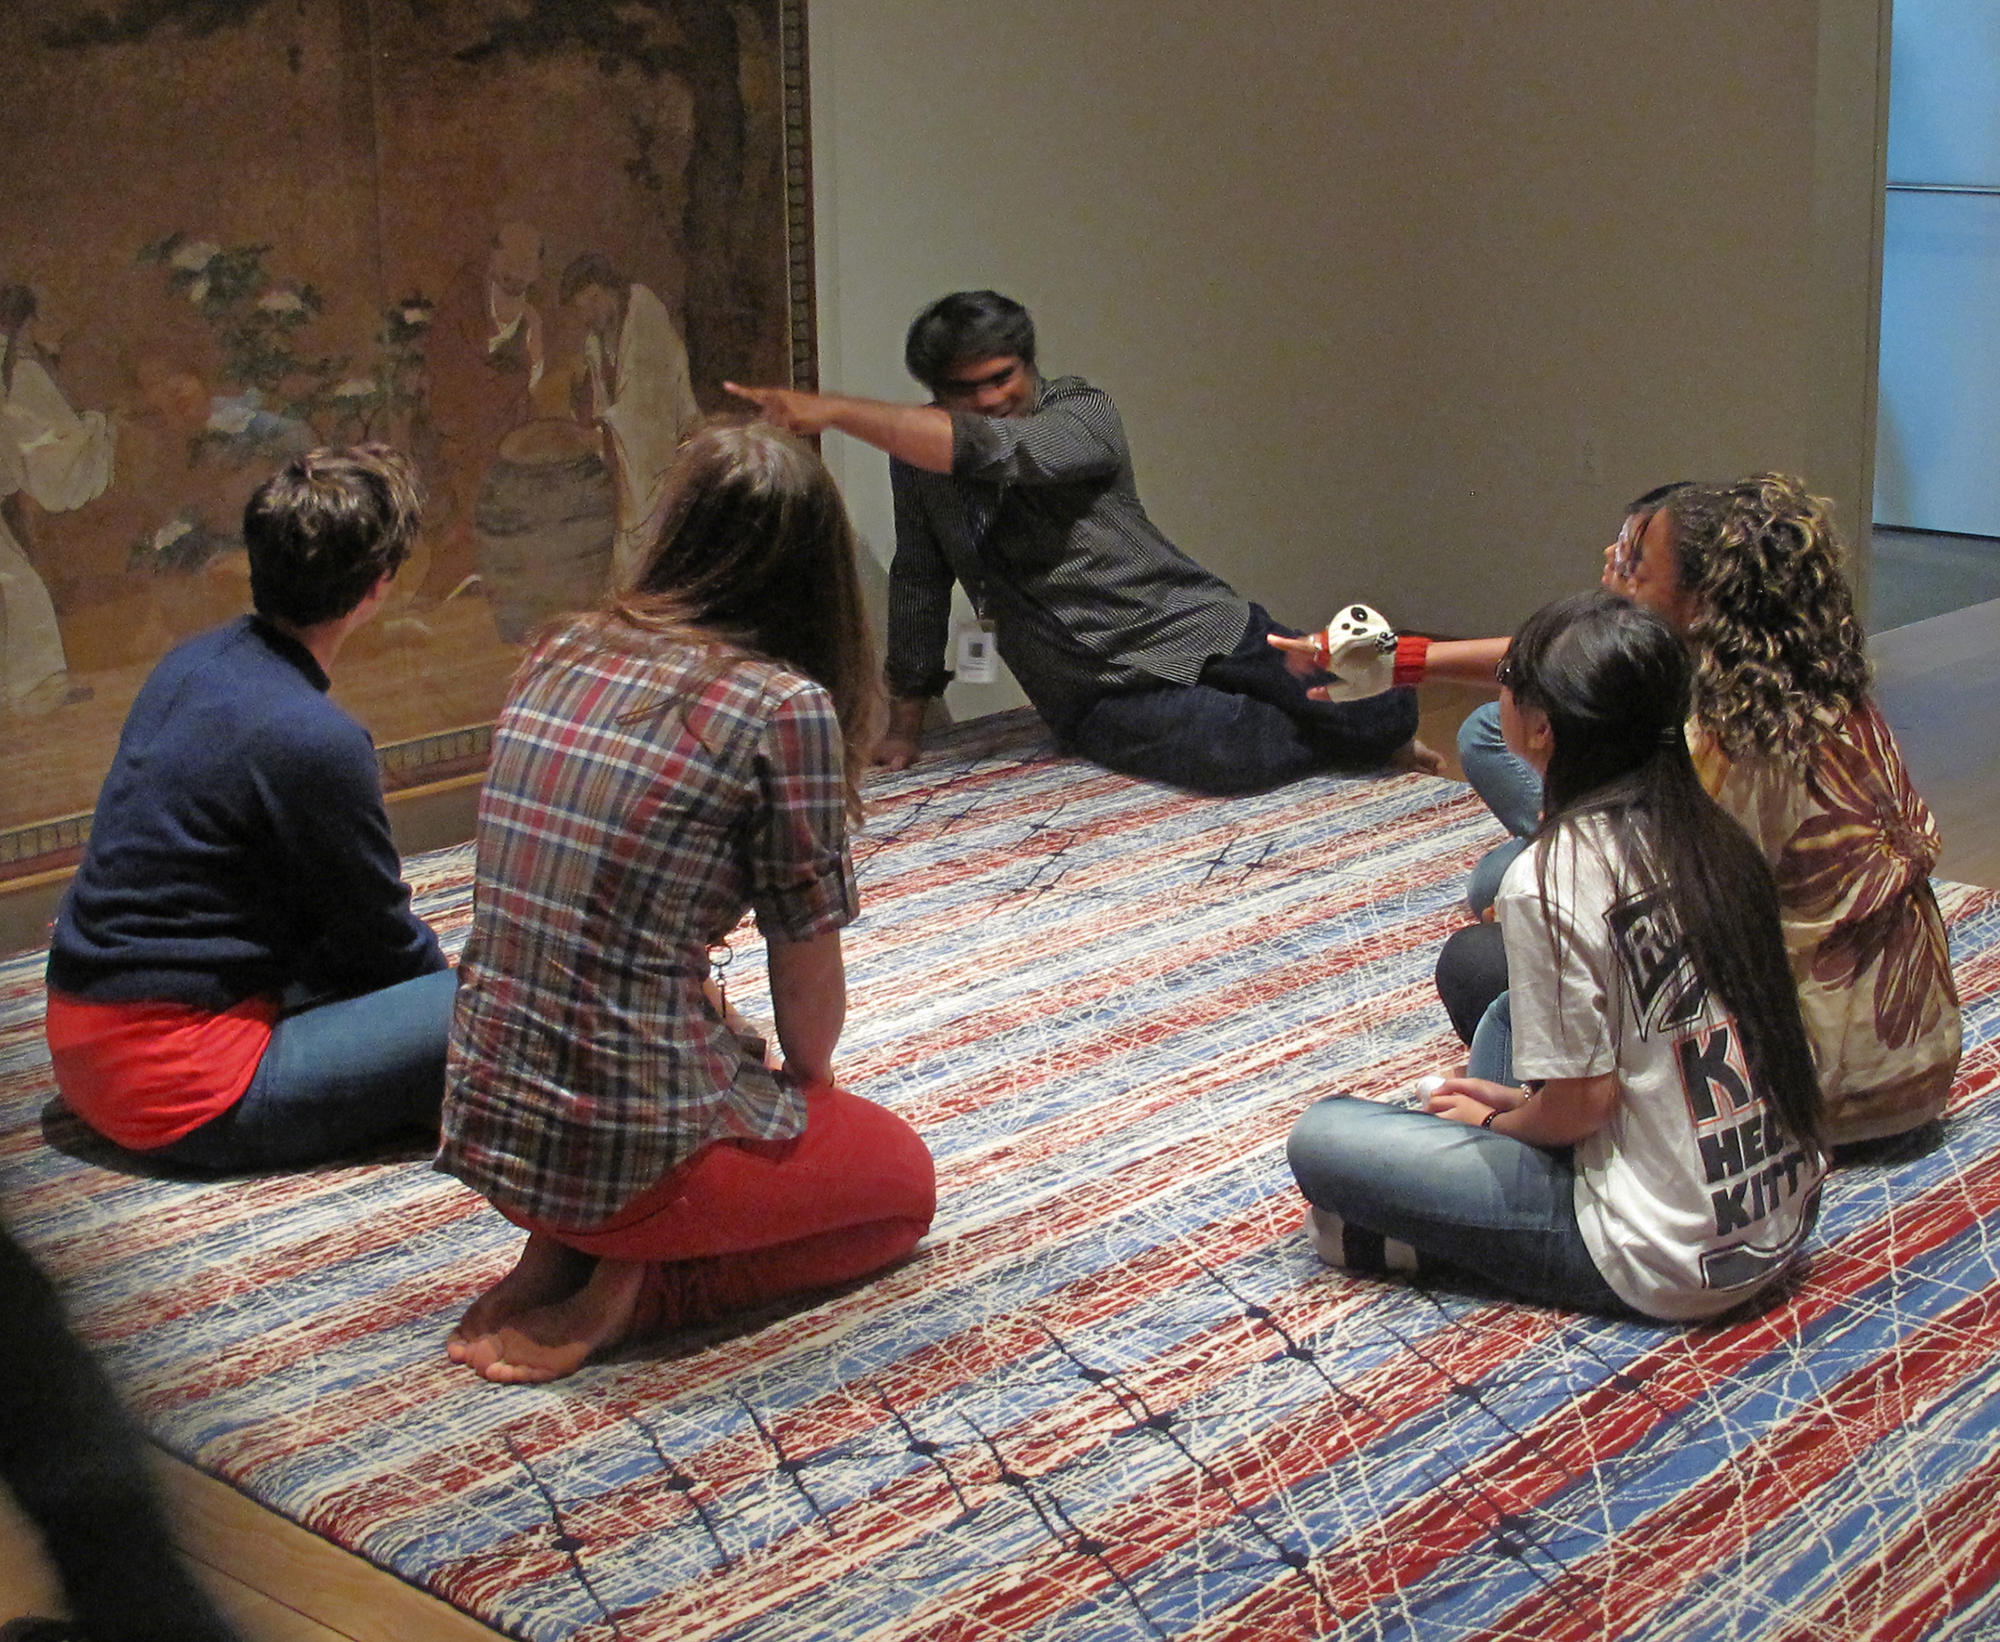 Shuddhabrata Sengupta of the Raqs Media Collective talks with the Gardner's Teens Behind the Scenes, 2012.